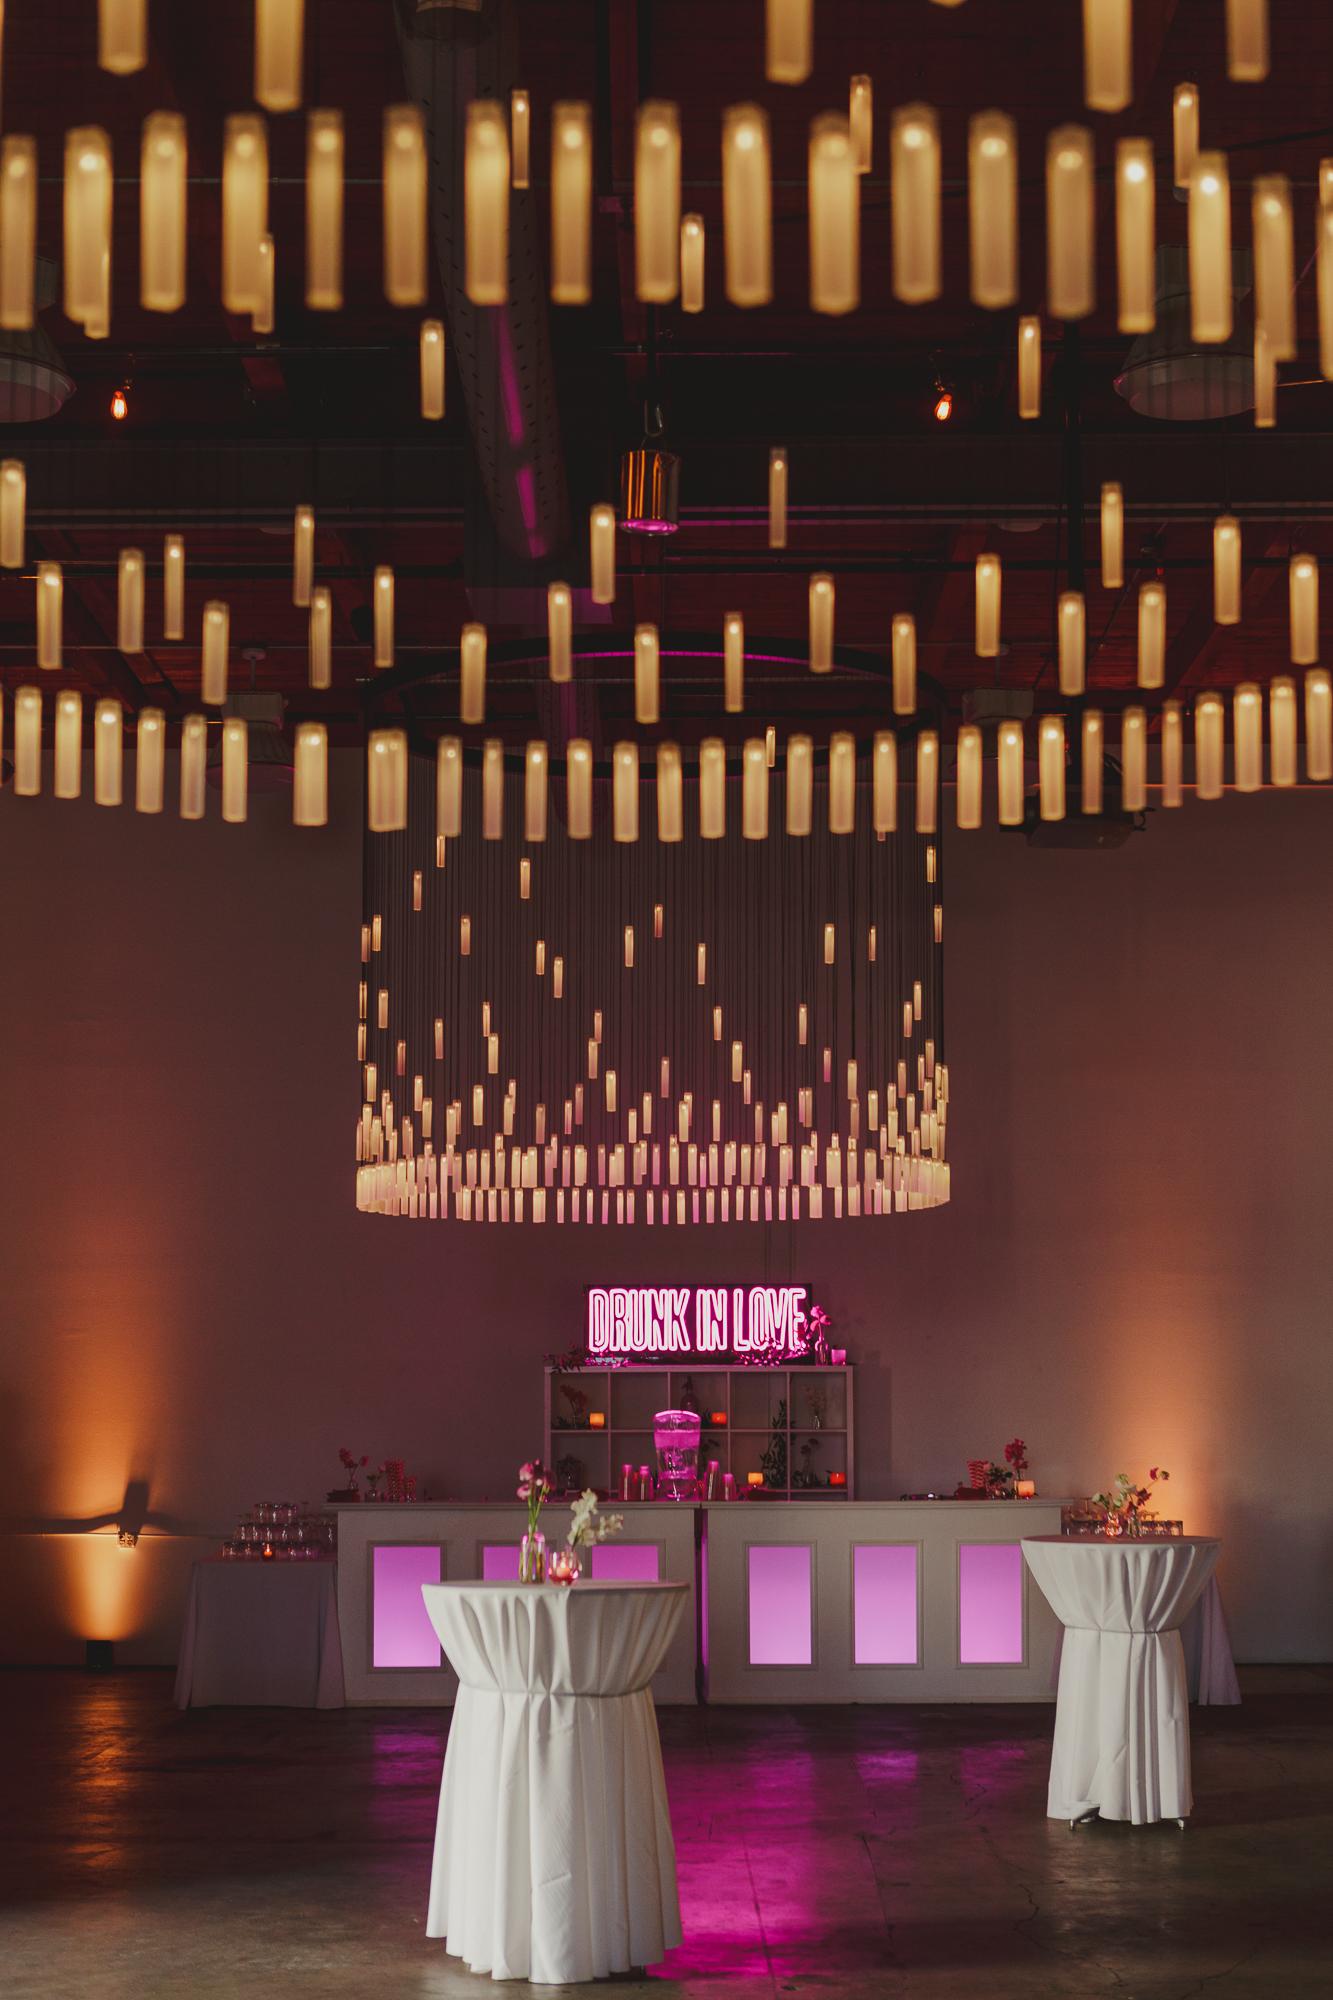 canvas event space wedding photos by Krista Welch-0055.jpg